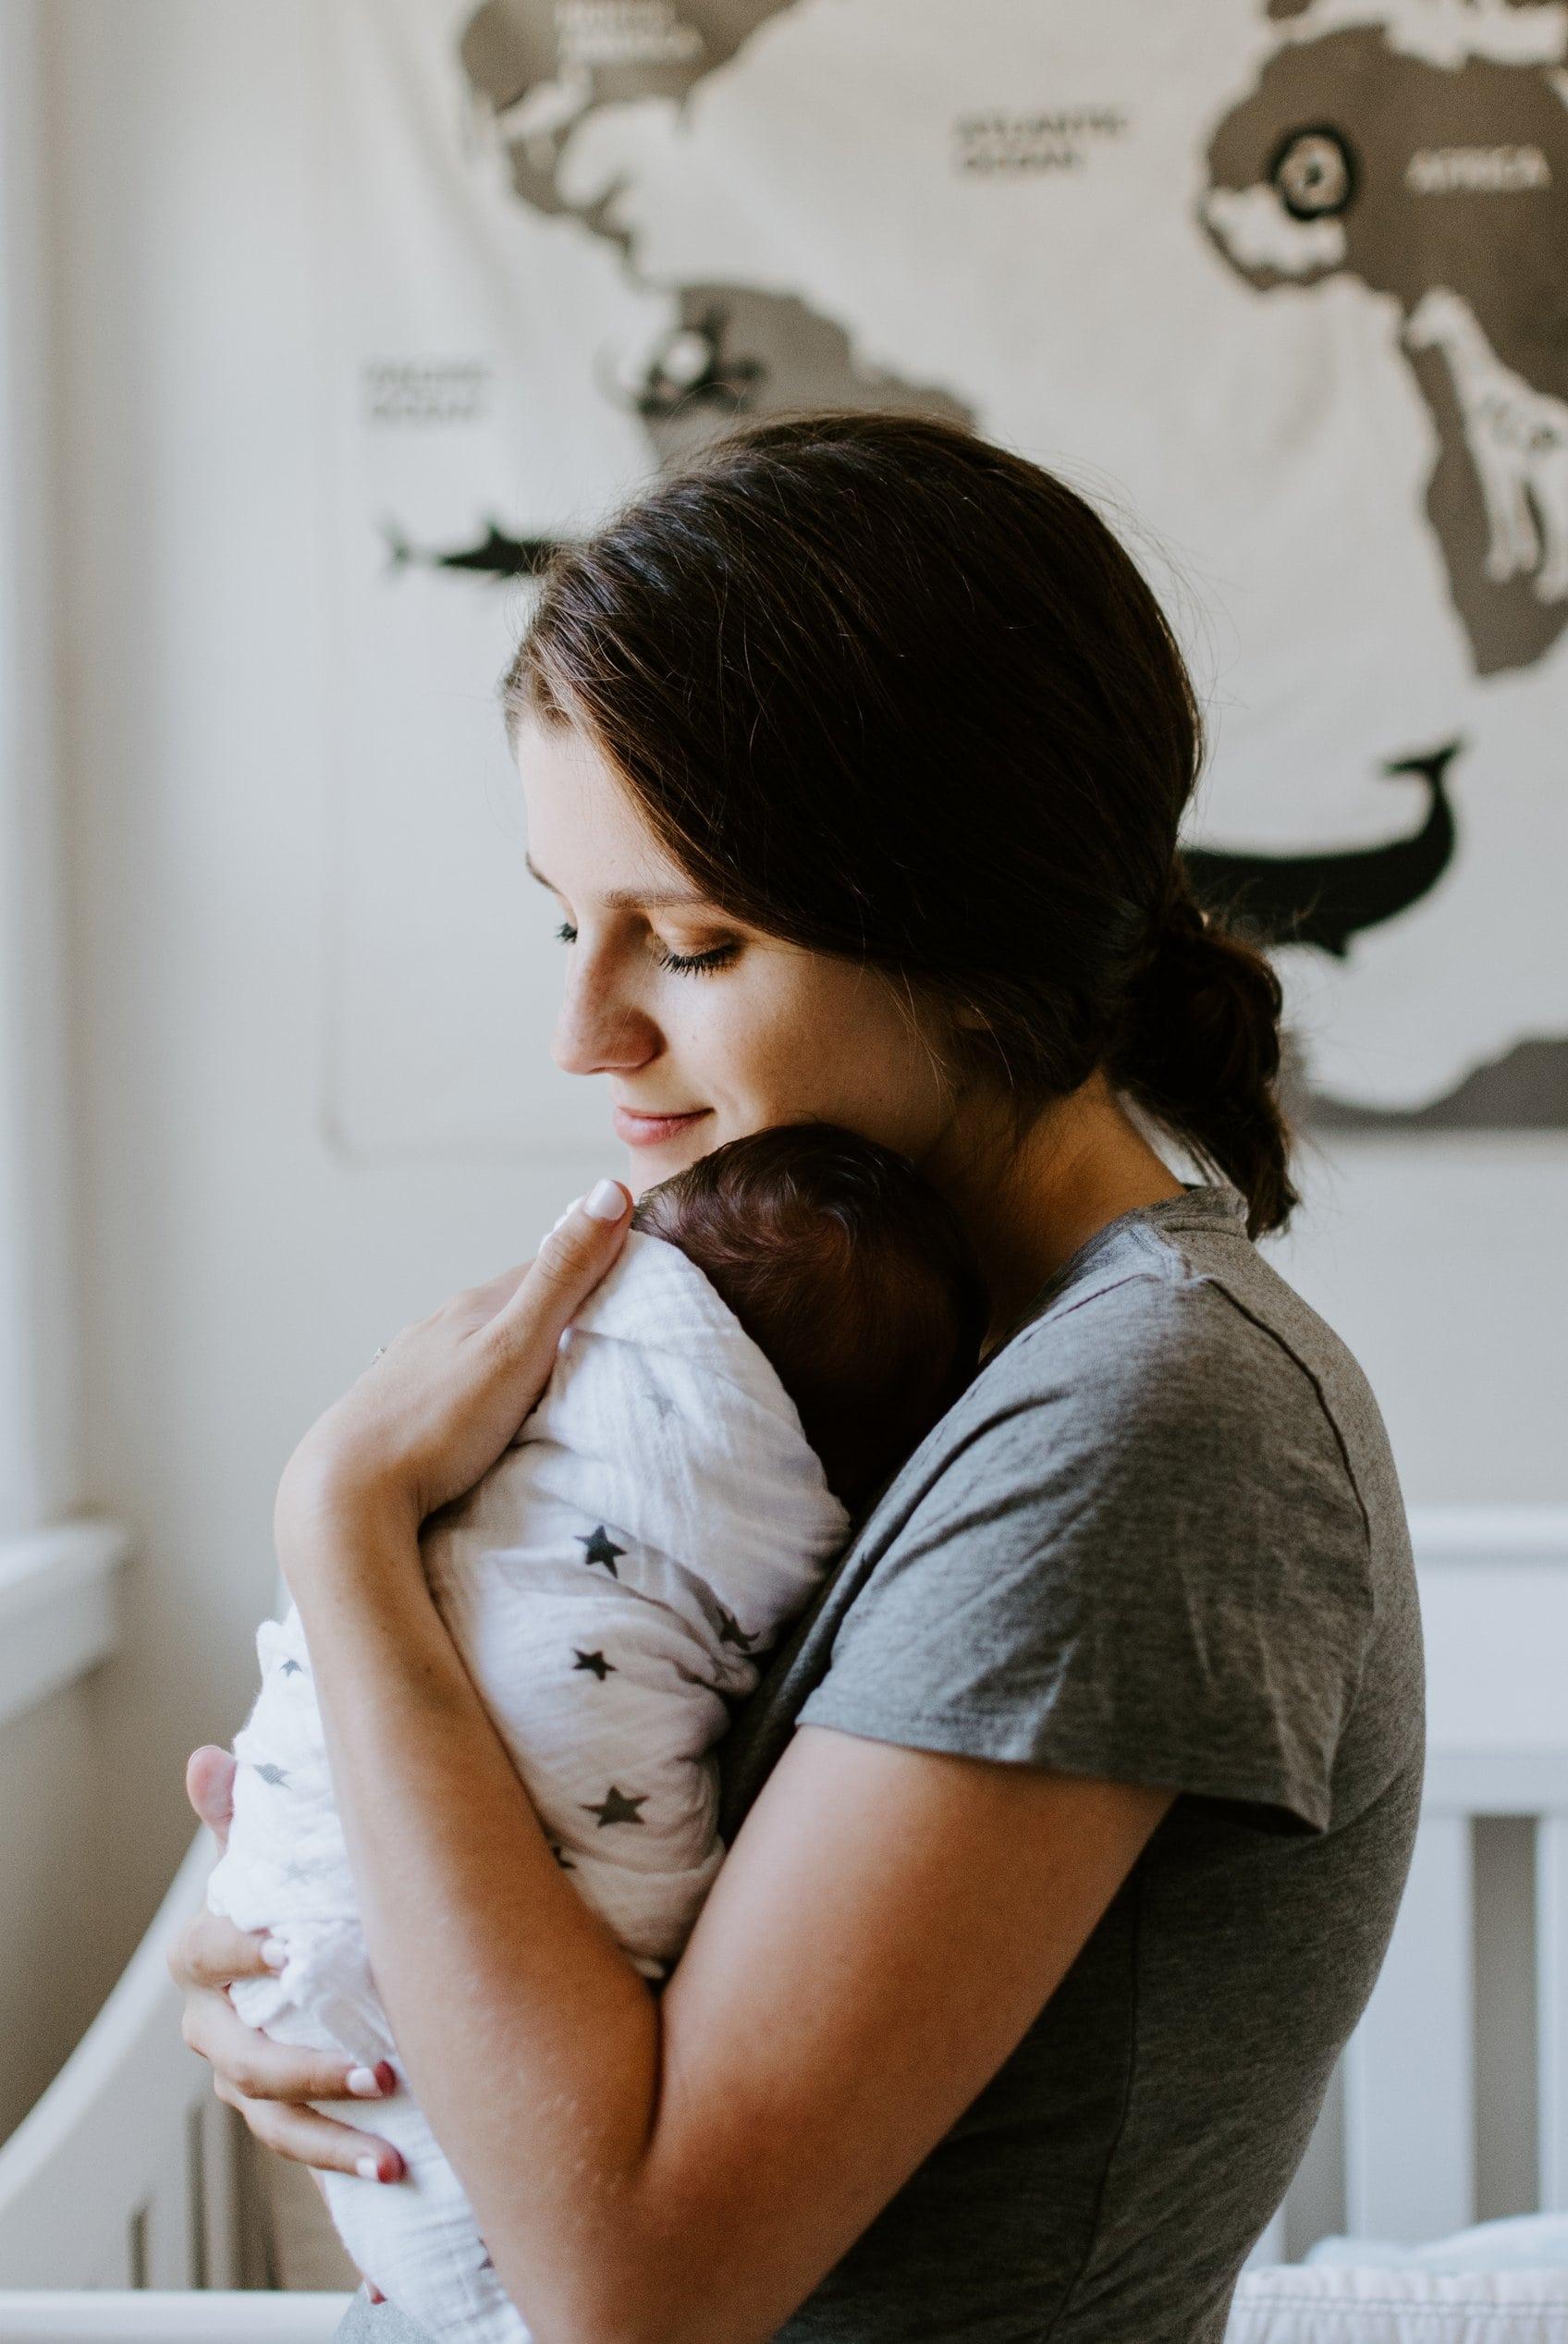 Image of loving mom putting baby down to sleep.